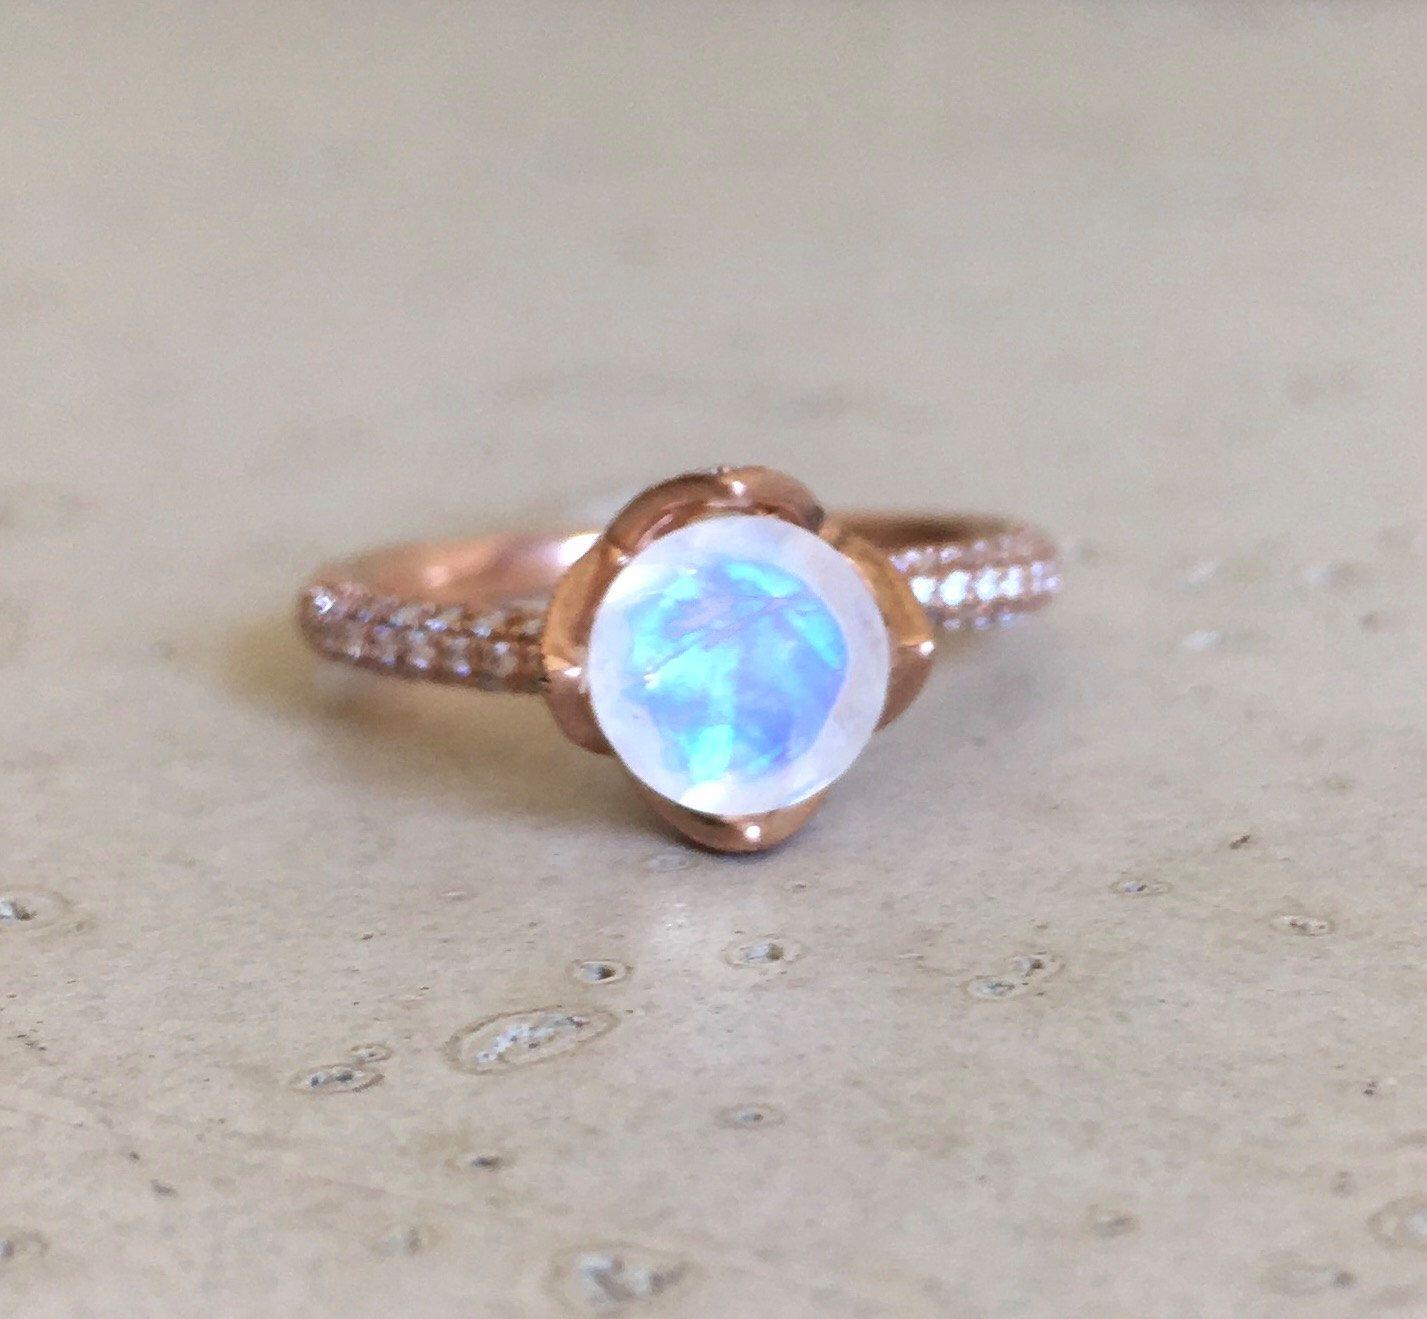 moonstone wedding ring sets Lotus Flower Moonstone Engagement Ring Rose Gold Moonstone Promise Ring Diamond Moonstone Bridal Ring Rose Gold Moonstone Wedding Ring